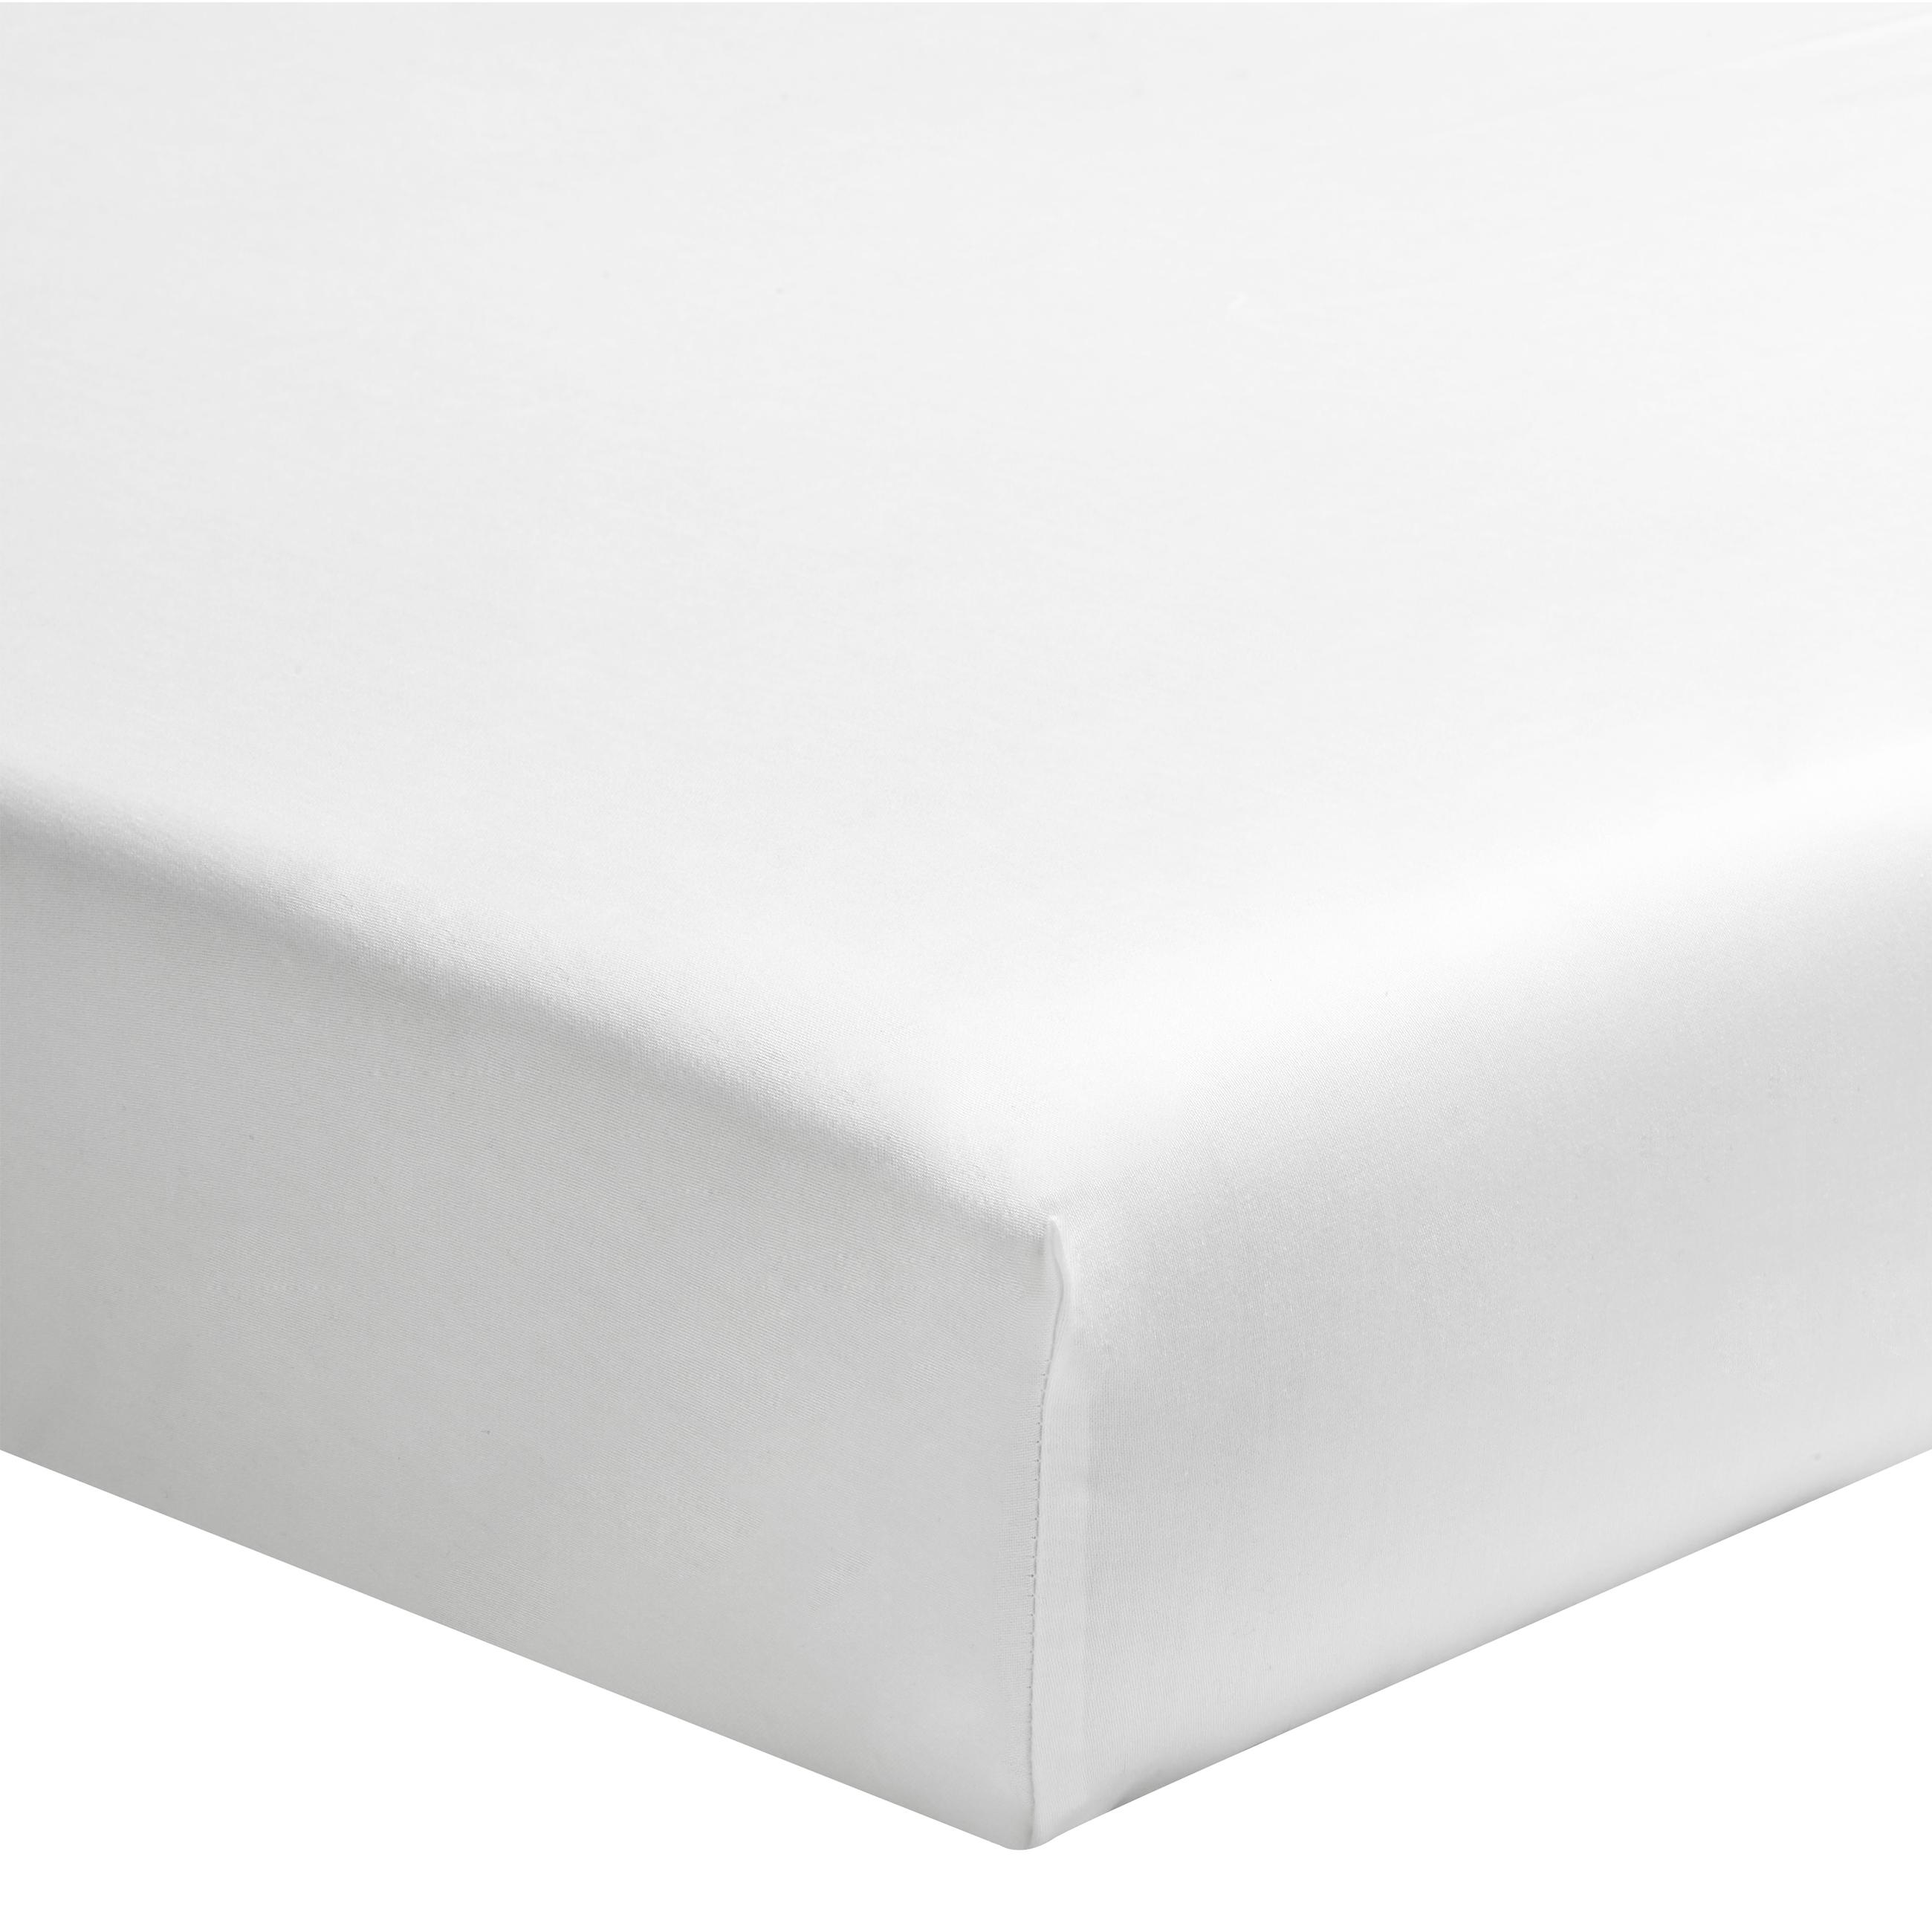 Drap housse uni en coton, Made in France blanc 80x200